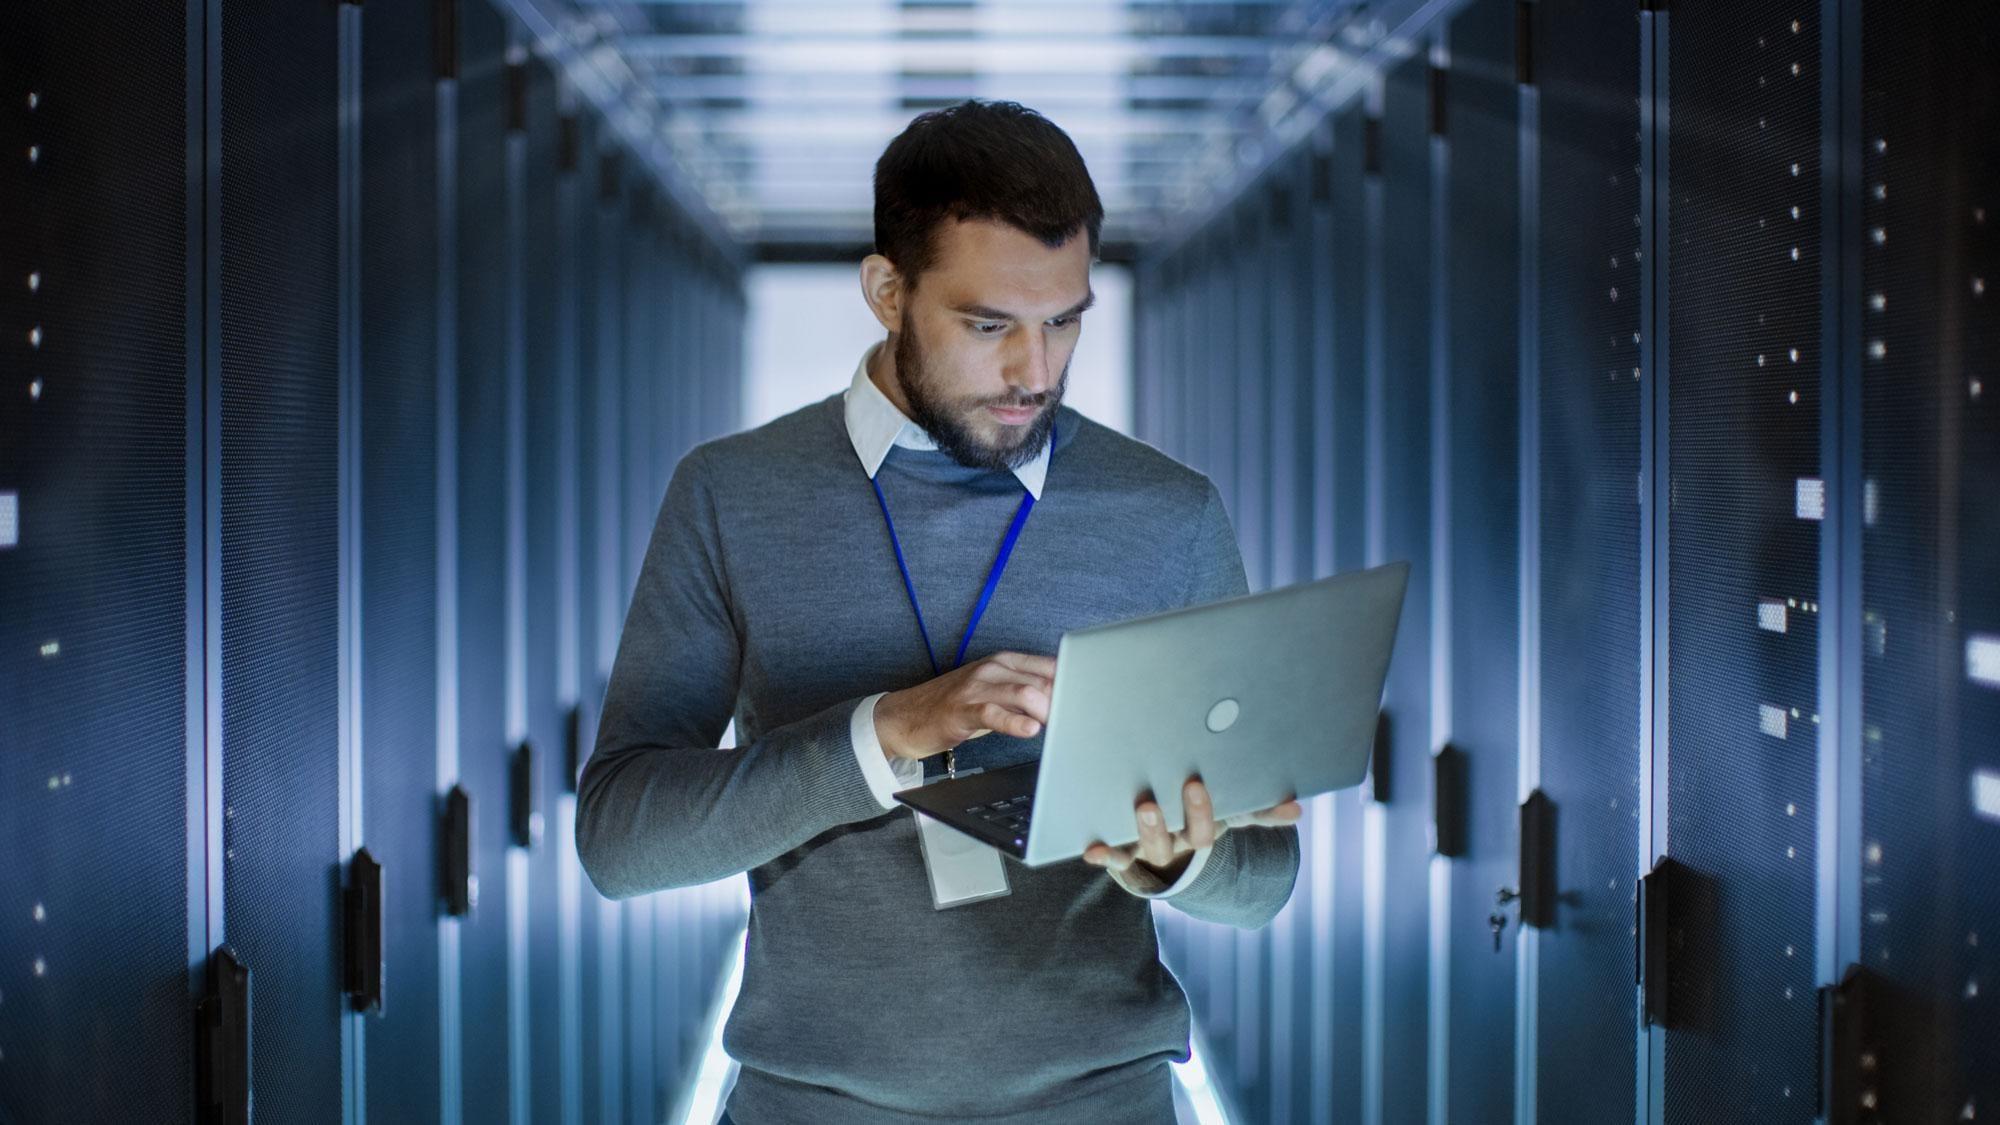 Man holding laptop in data warehouse